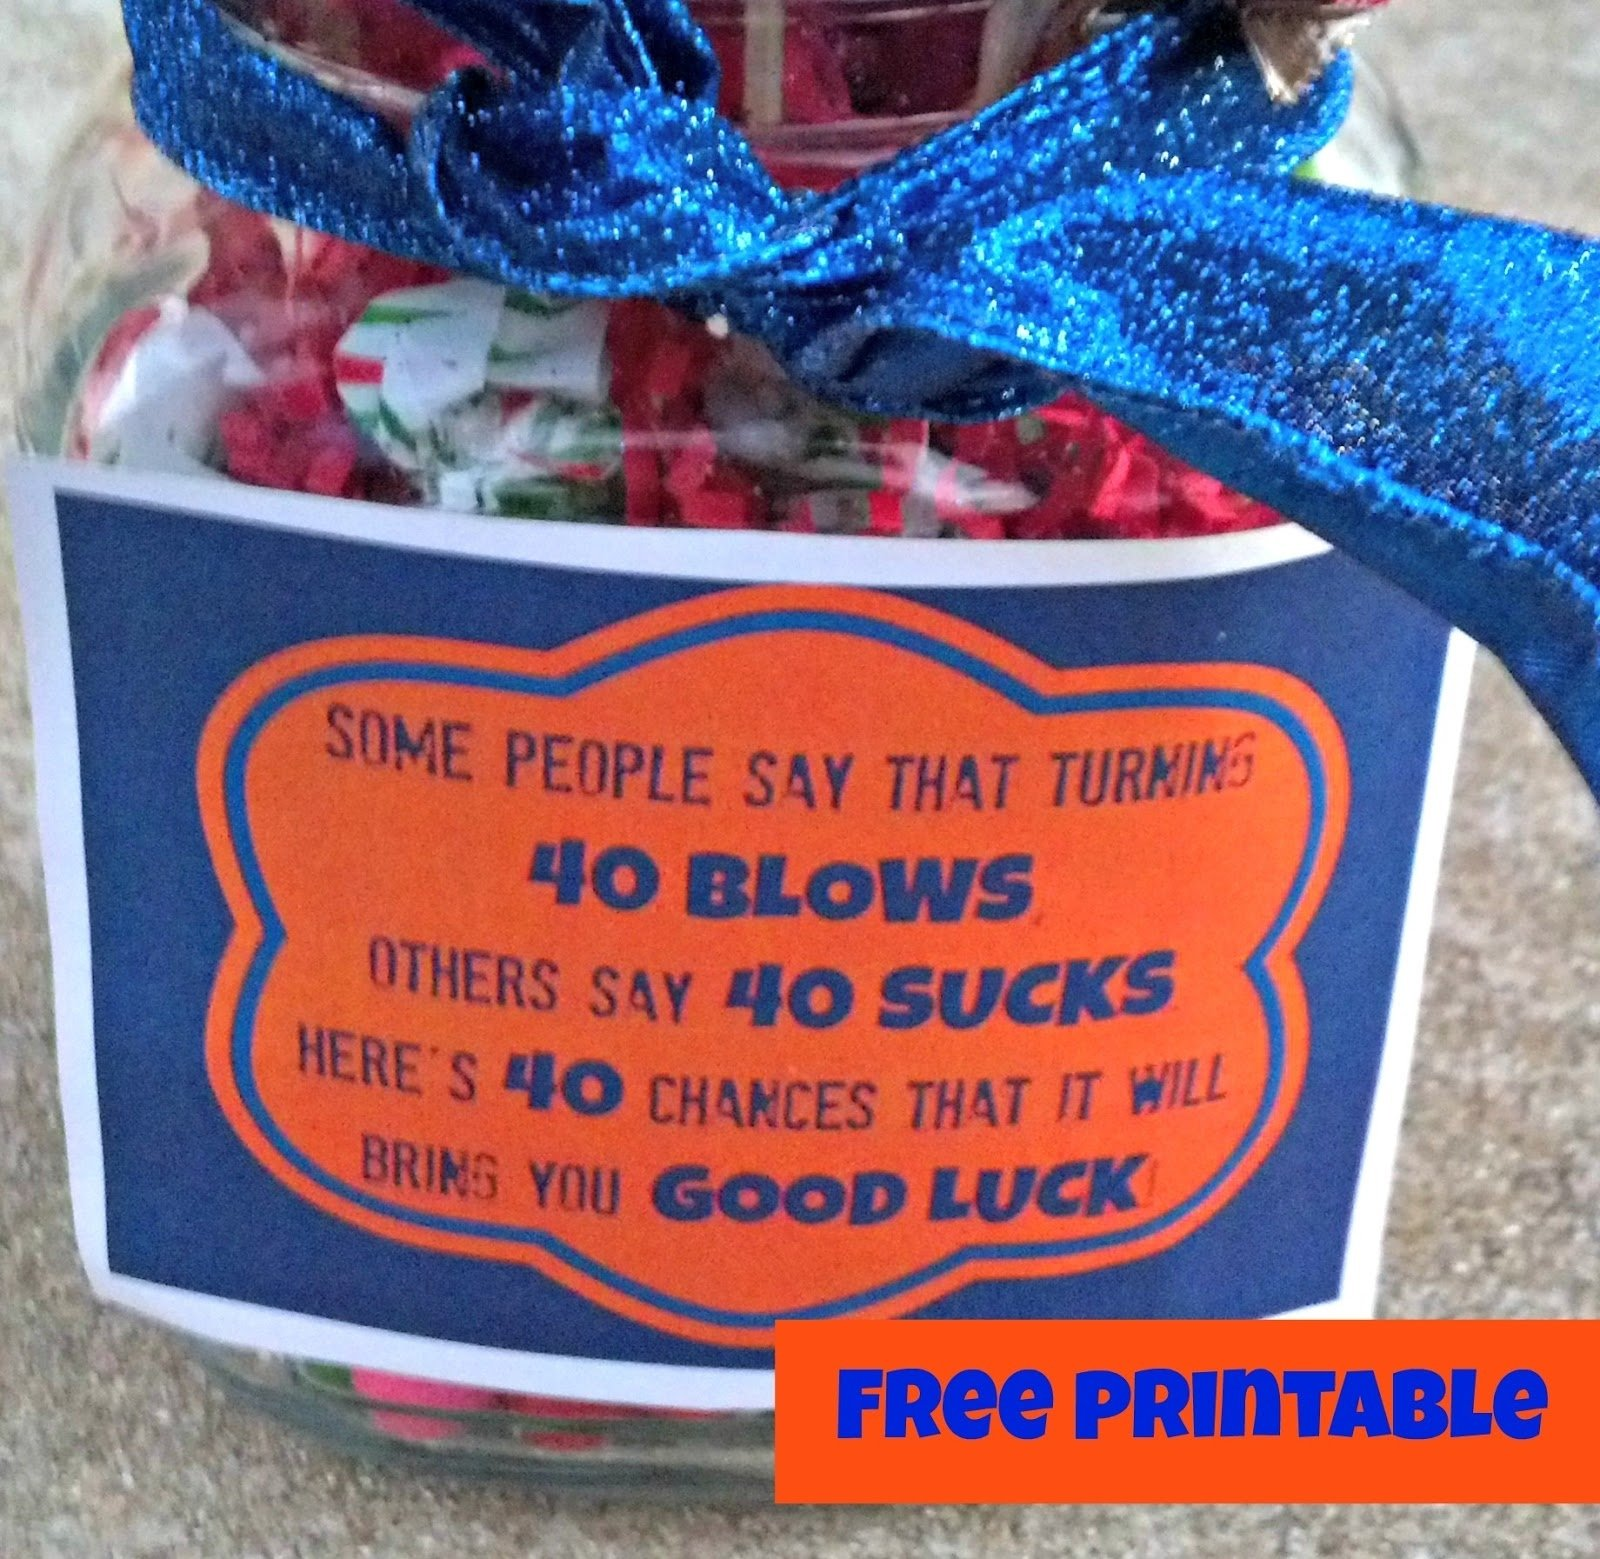 10 Nice Fun Birthday Ideas For Husband 40th Gifts 1